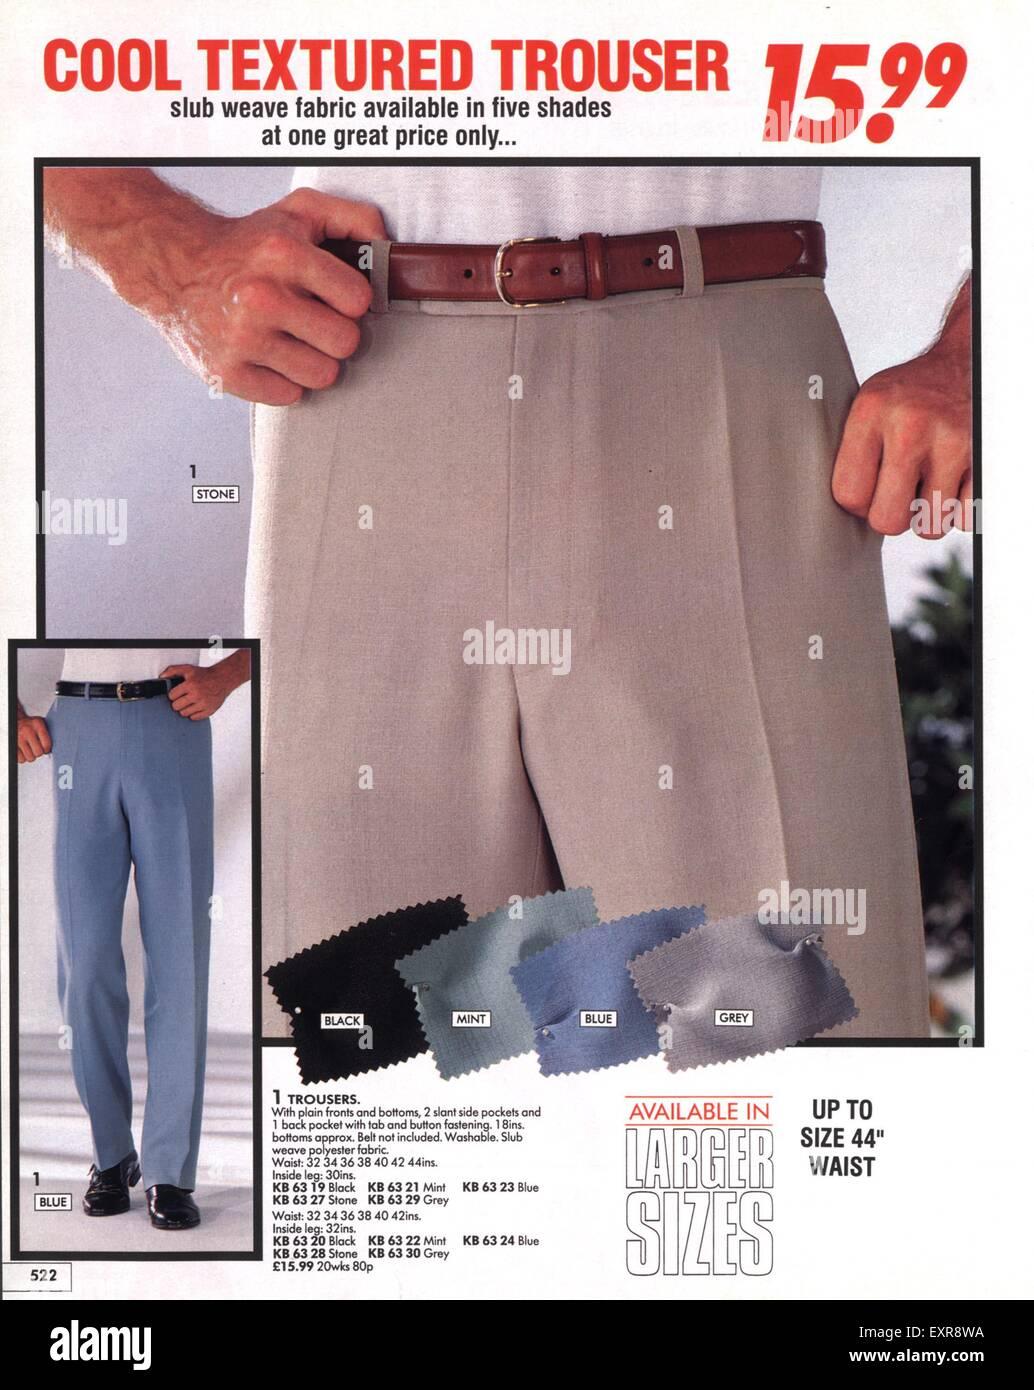 20s UK Mens Fashion Catalogue/ Brochure Plate Stock Photo   Alamy